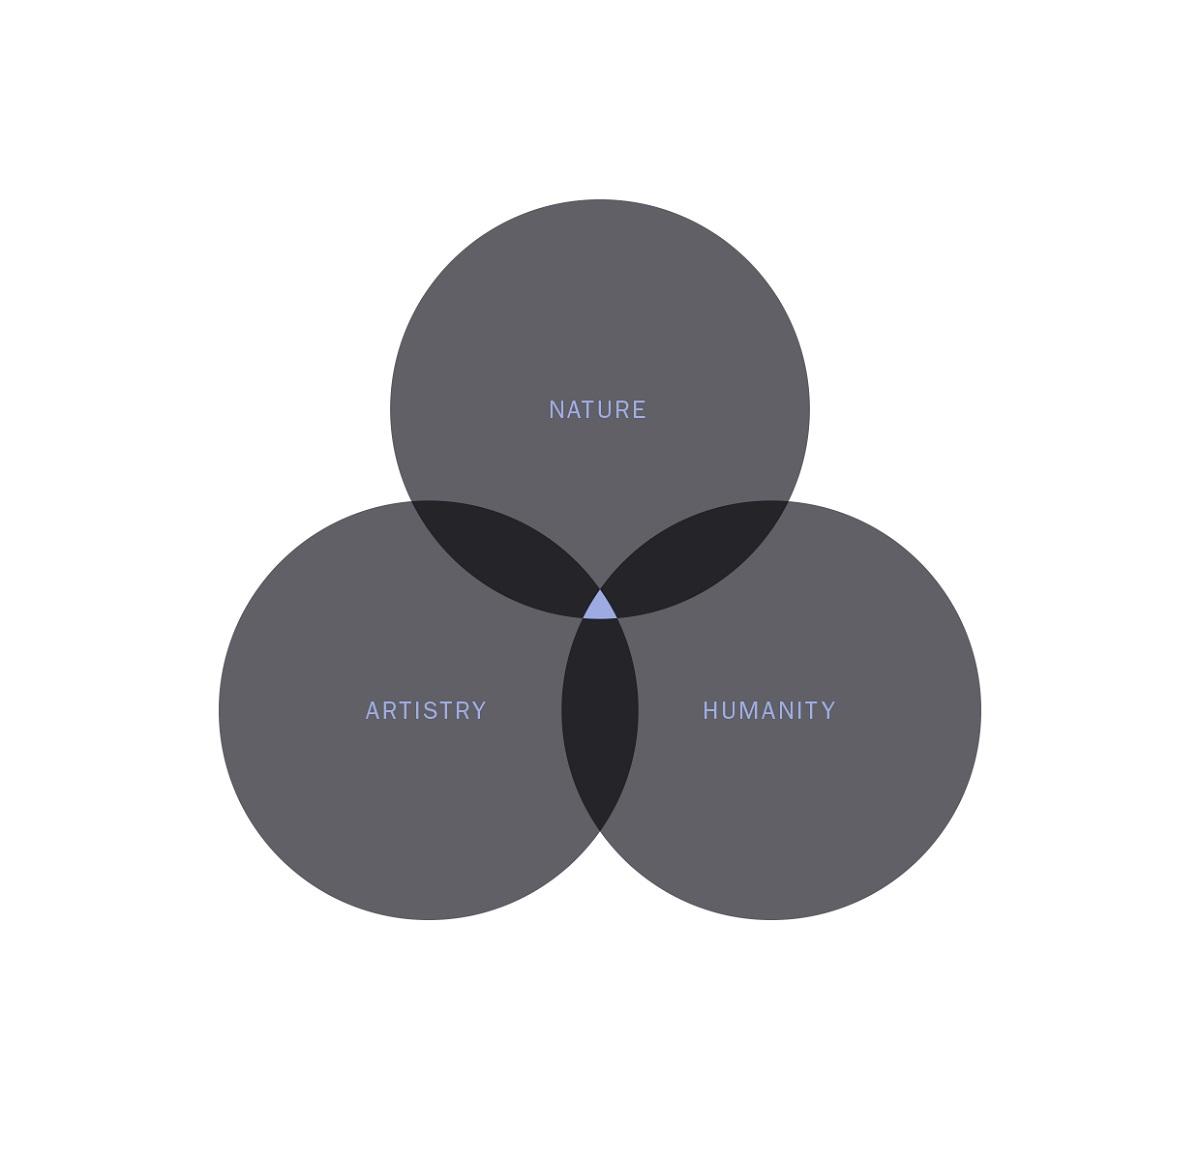 3 Circles Venn Diagram Examples